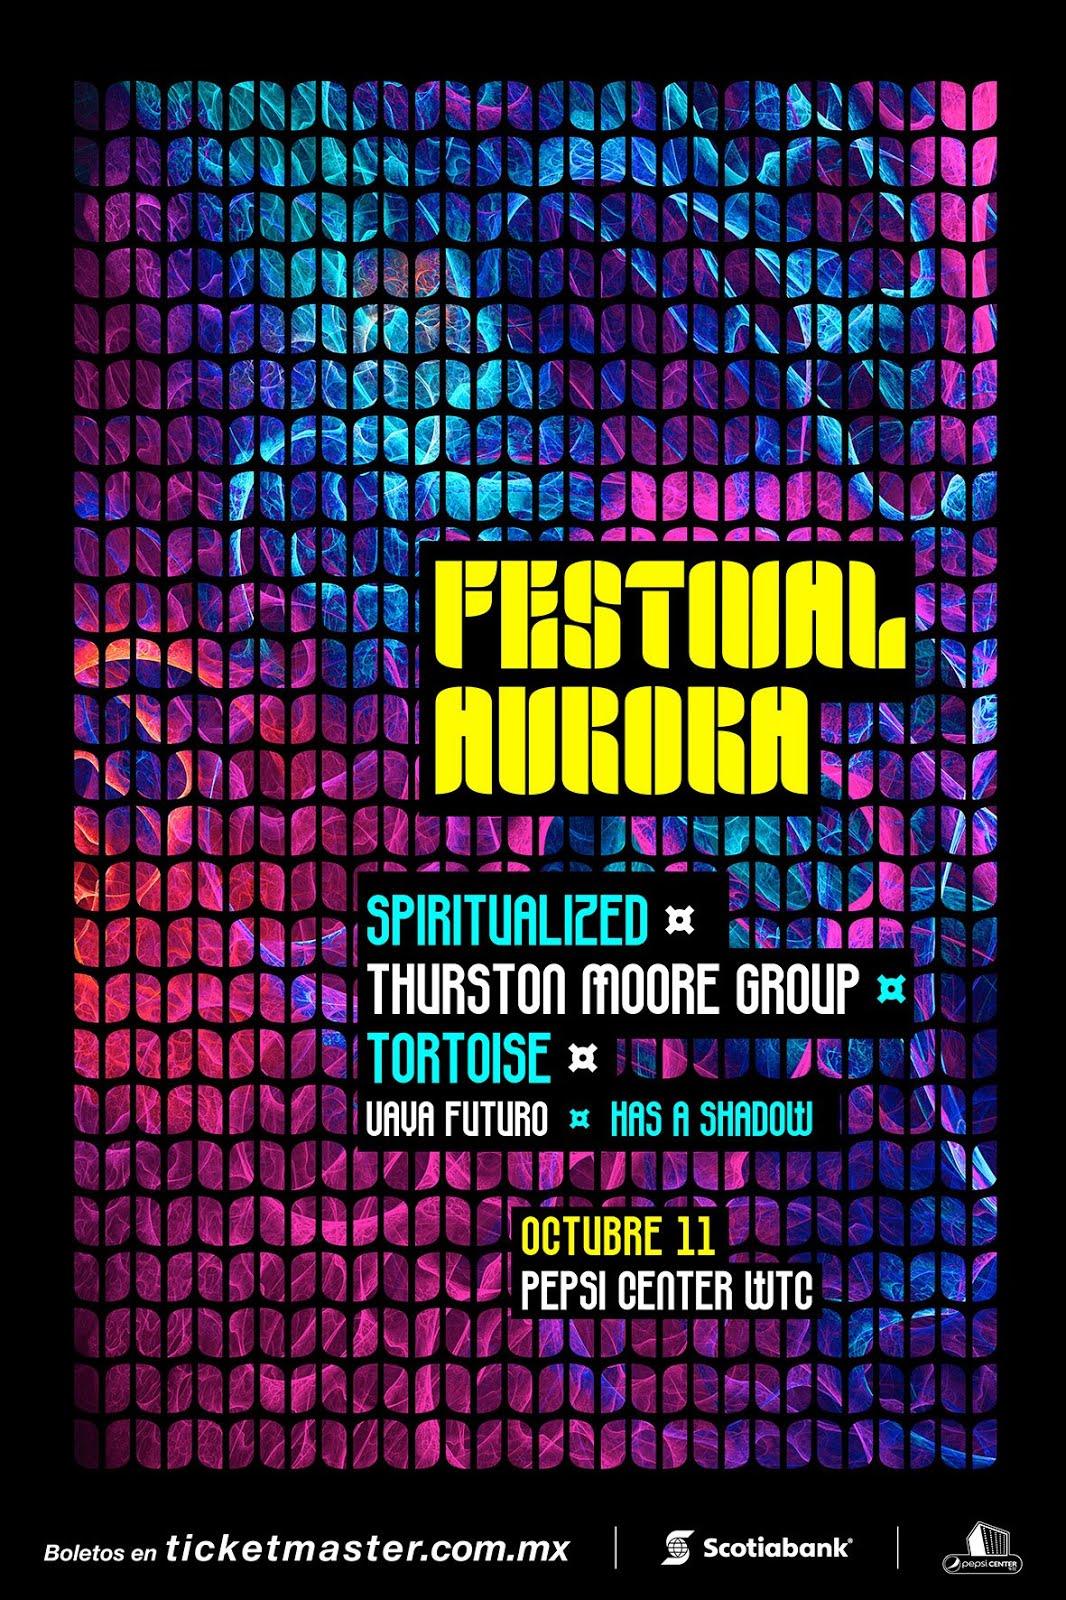 Cartel oficial del festival